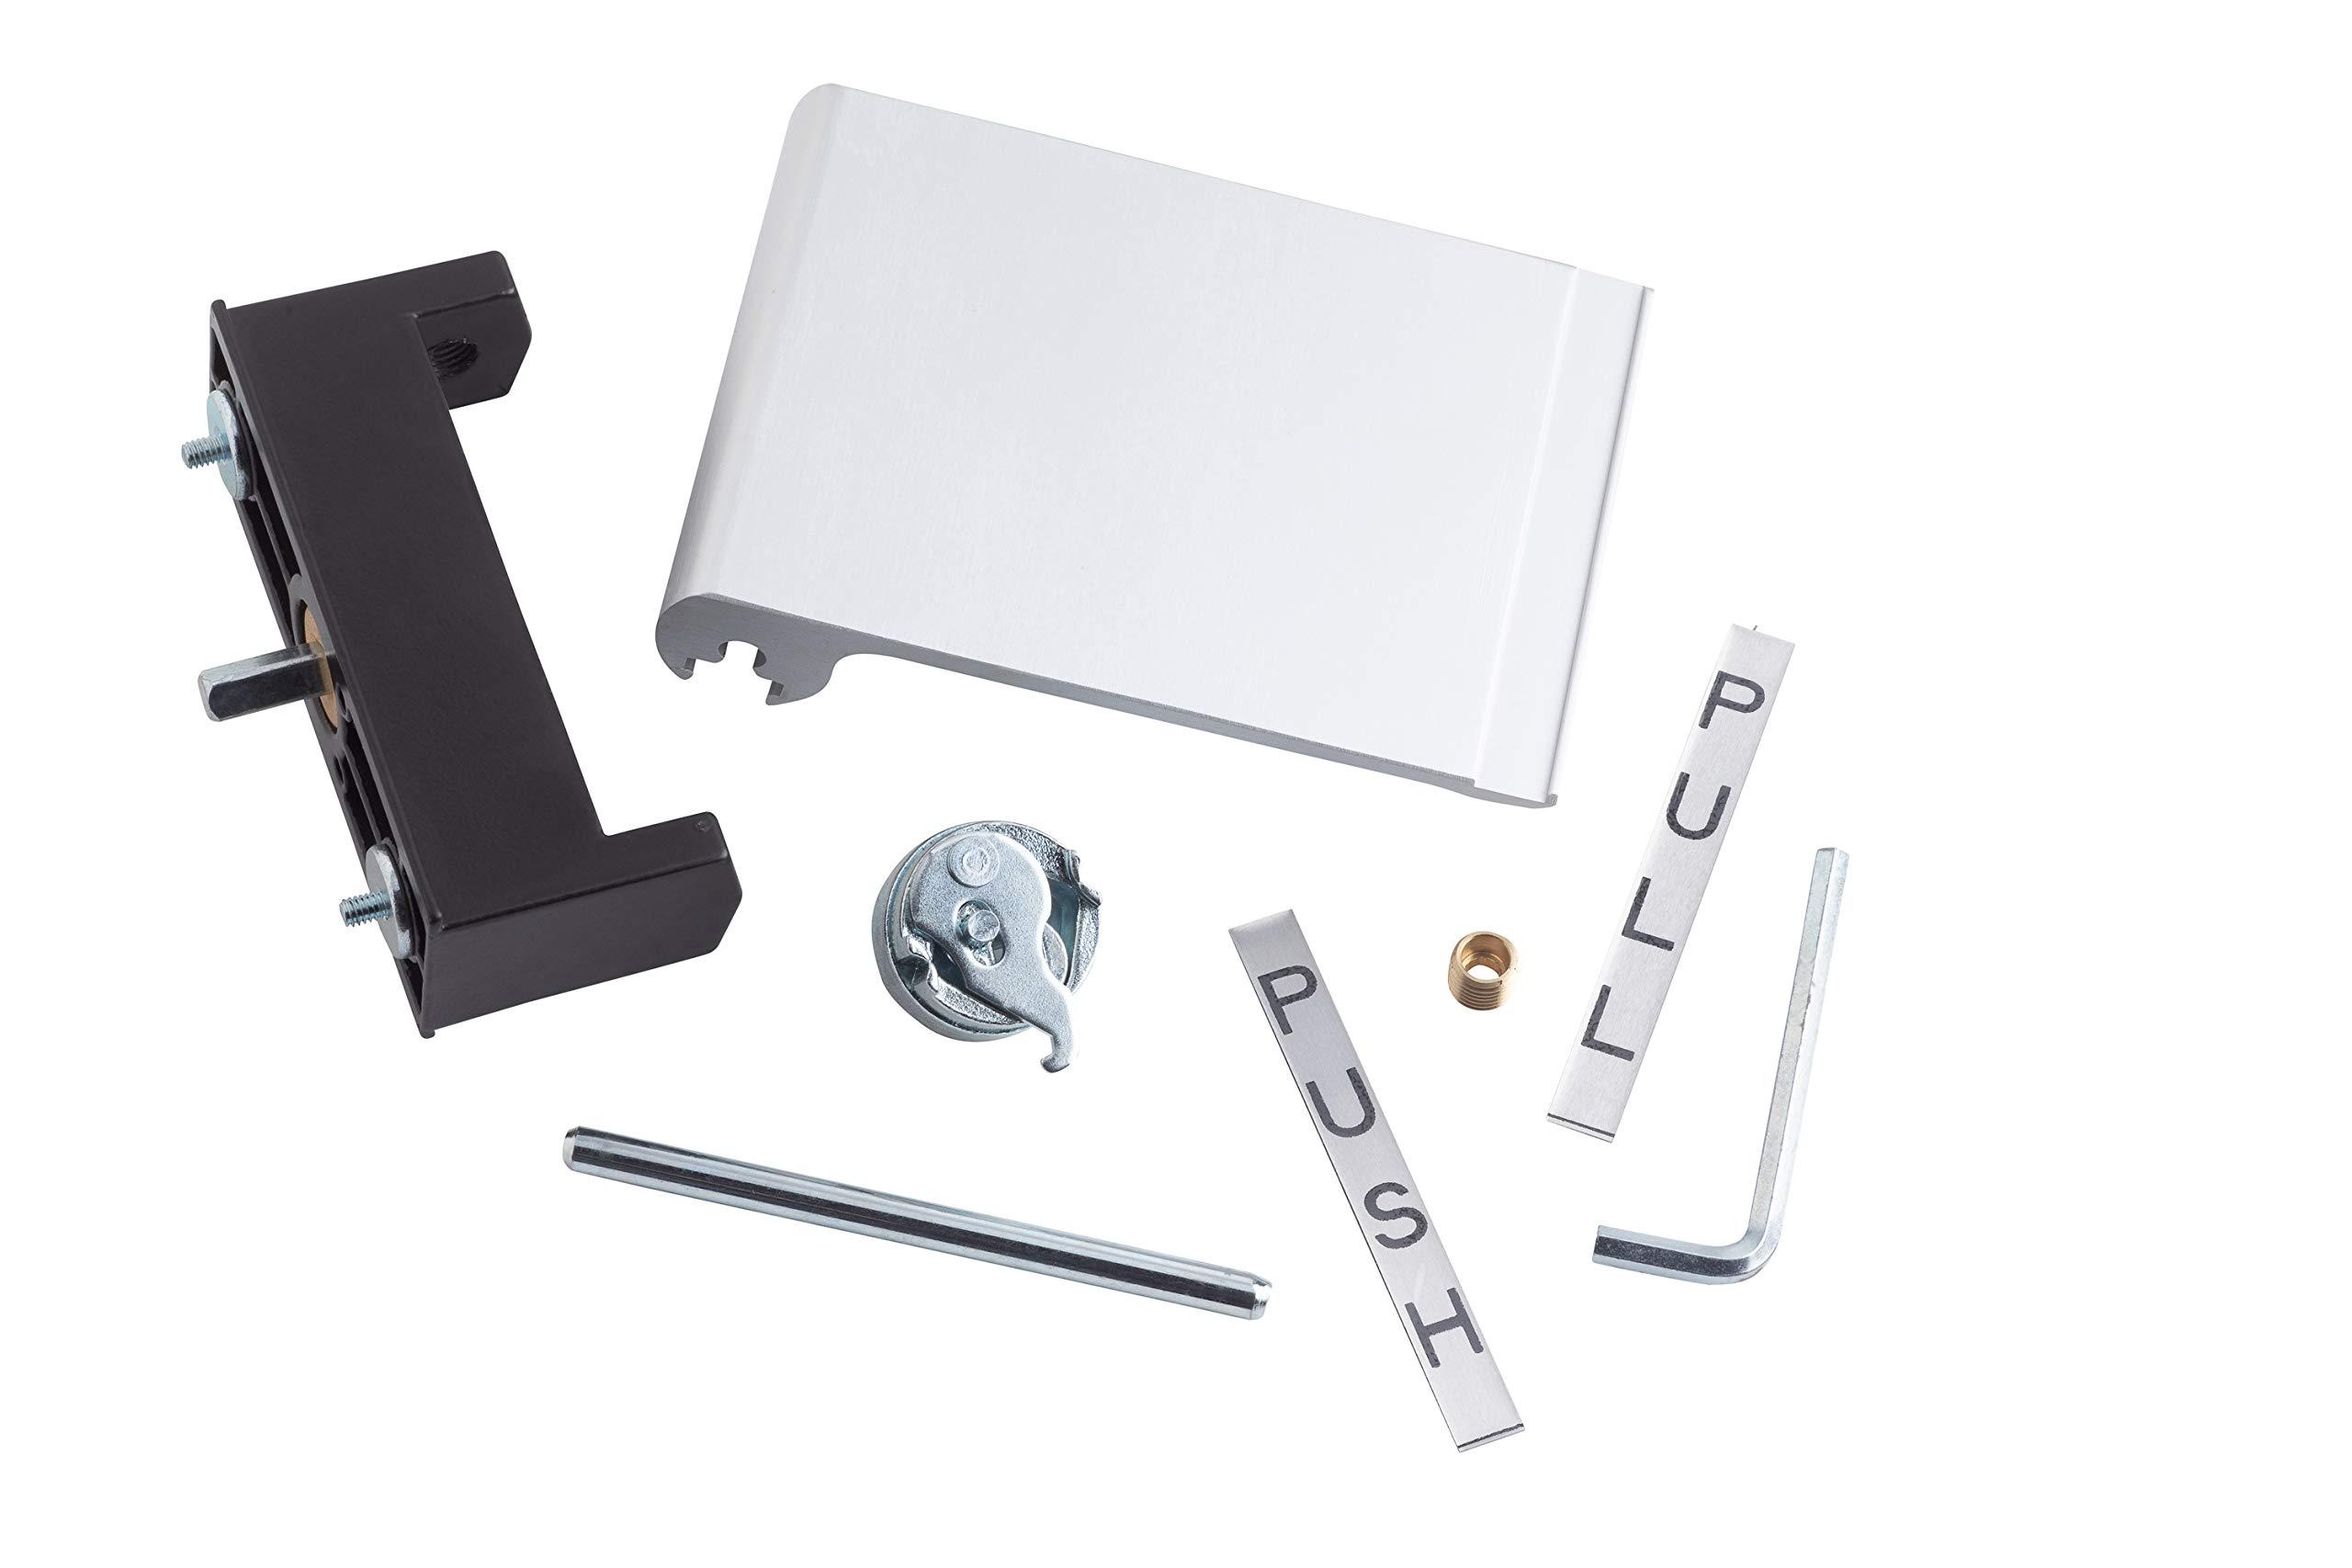 Satin Nickel Global Door Controls CPS3535-US15-M Square Corner Imperial USA X 3.5 Full Mortise Spring Door Hinge-Set of 3 3.5 x 3.5 3 Piece